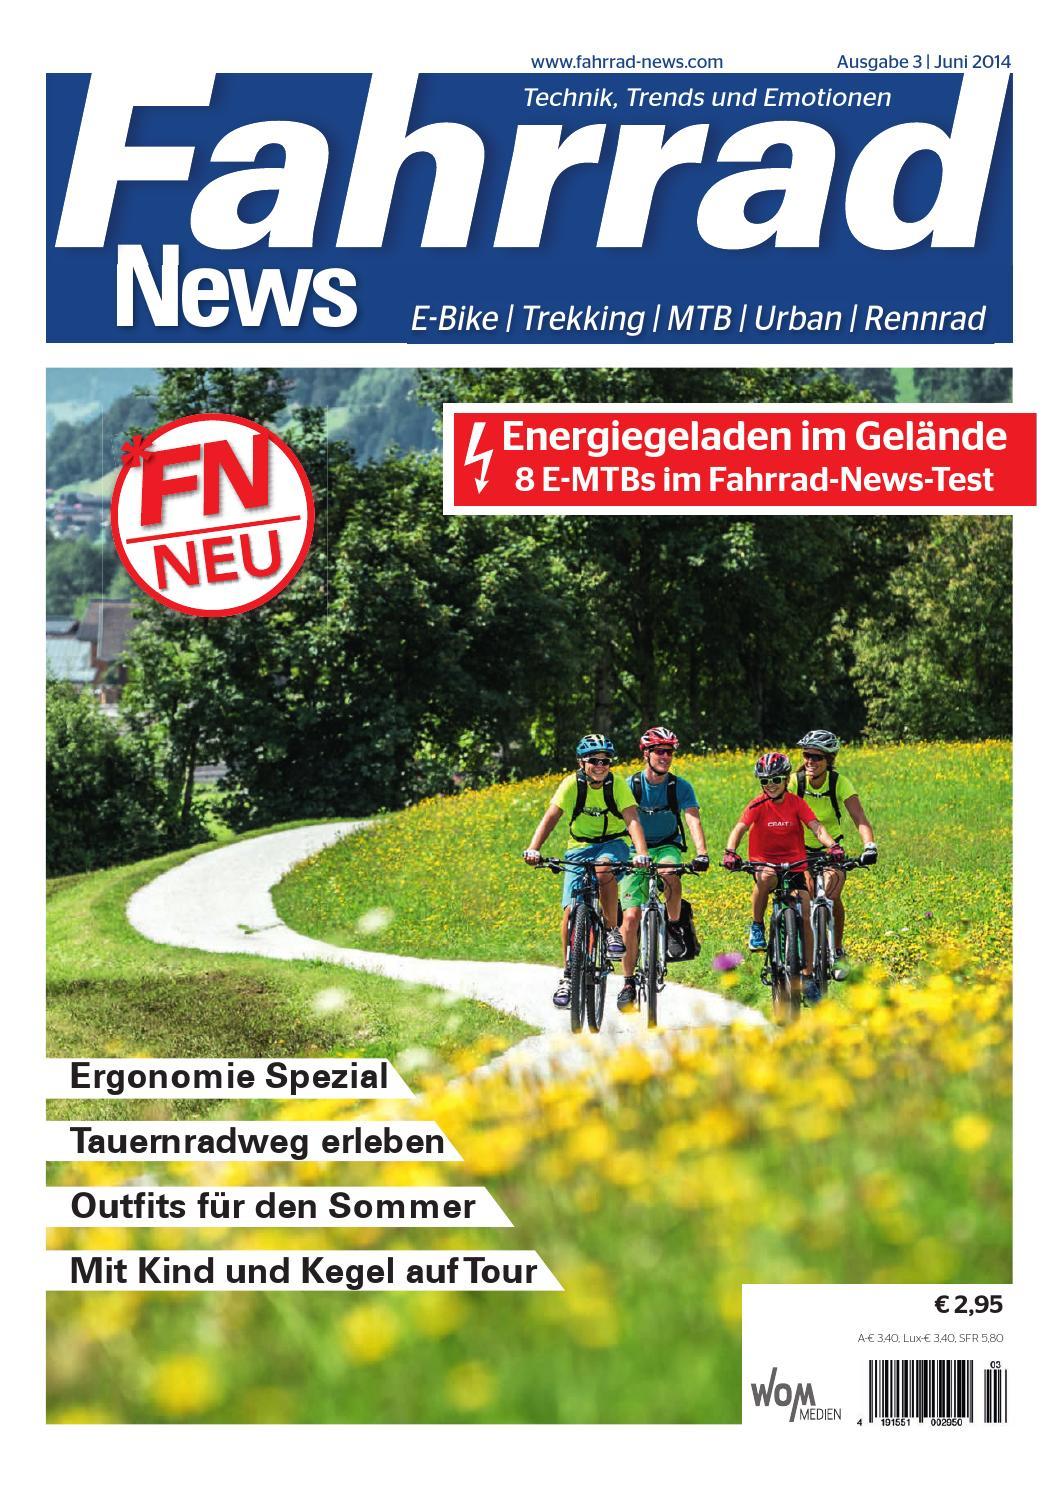 fahrrad news by wom medien issuu. Black Bedroom Furniture Sets. Home Design Ideas